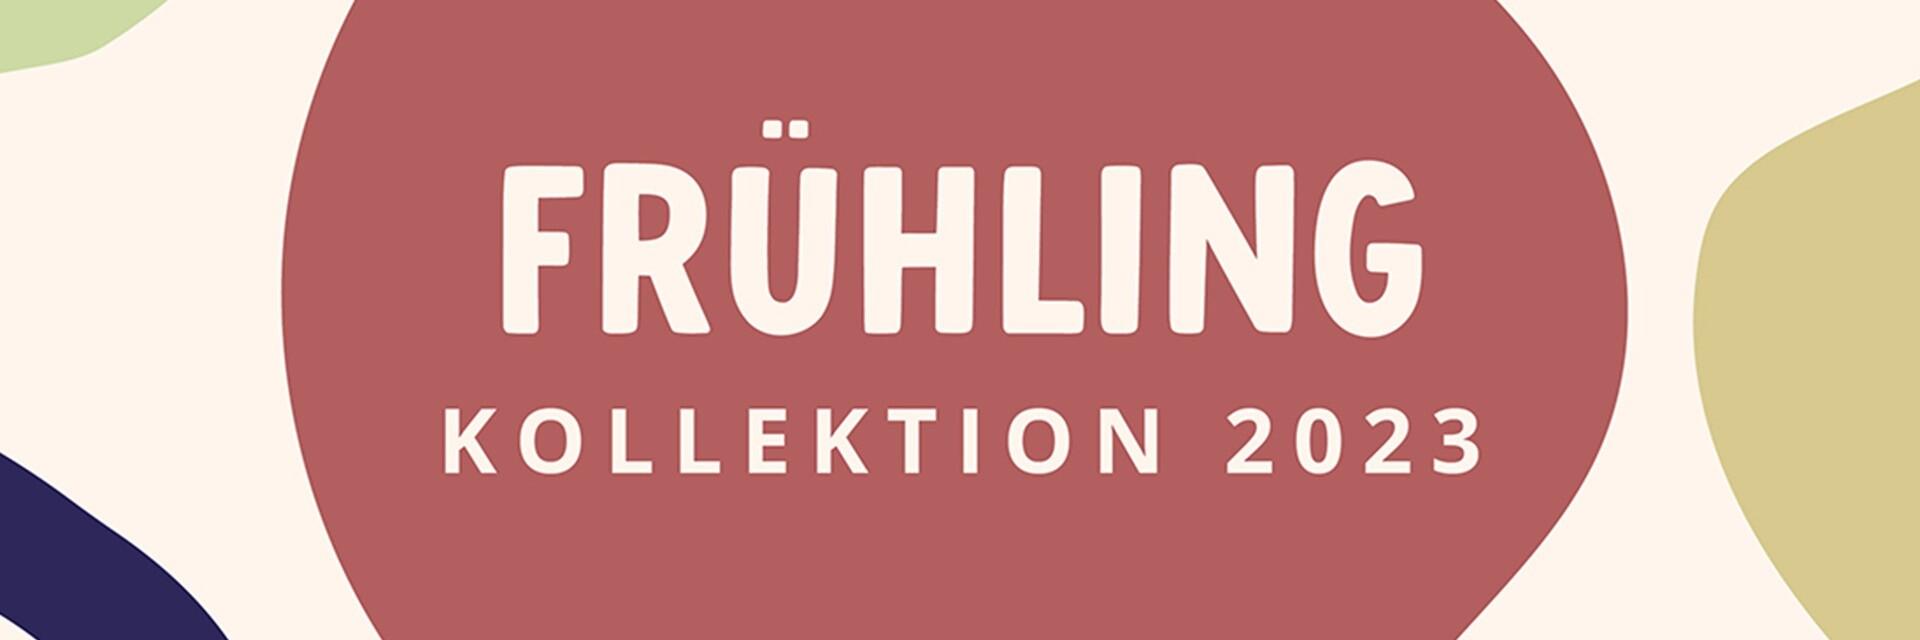 01_autocontent_herbst_2021_neue_Kollektion